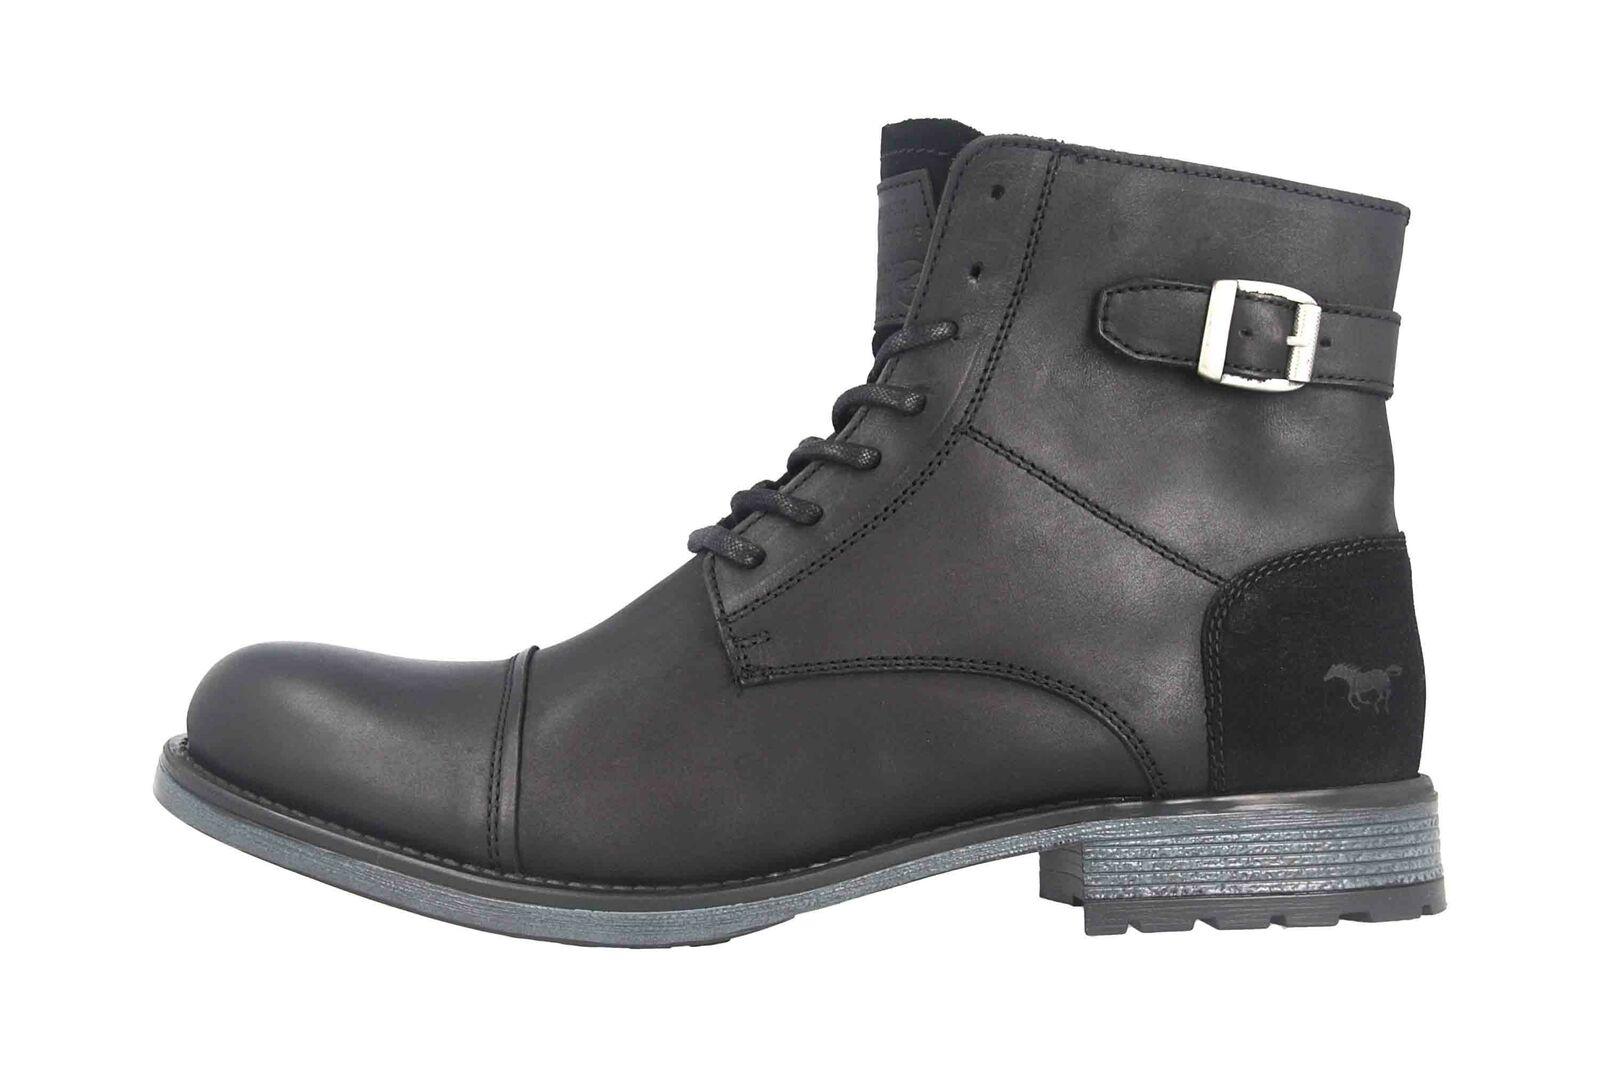 Mustang Shoes Slipper in Übergrößen große Damenschuhe Grau XXL